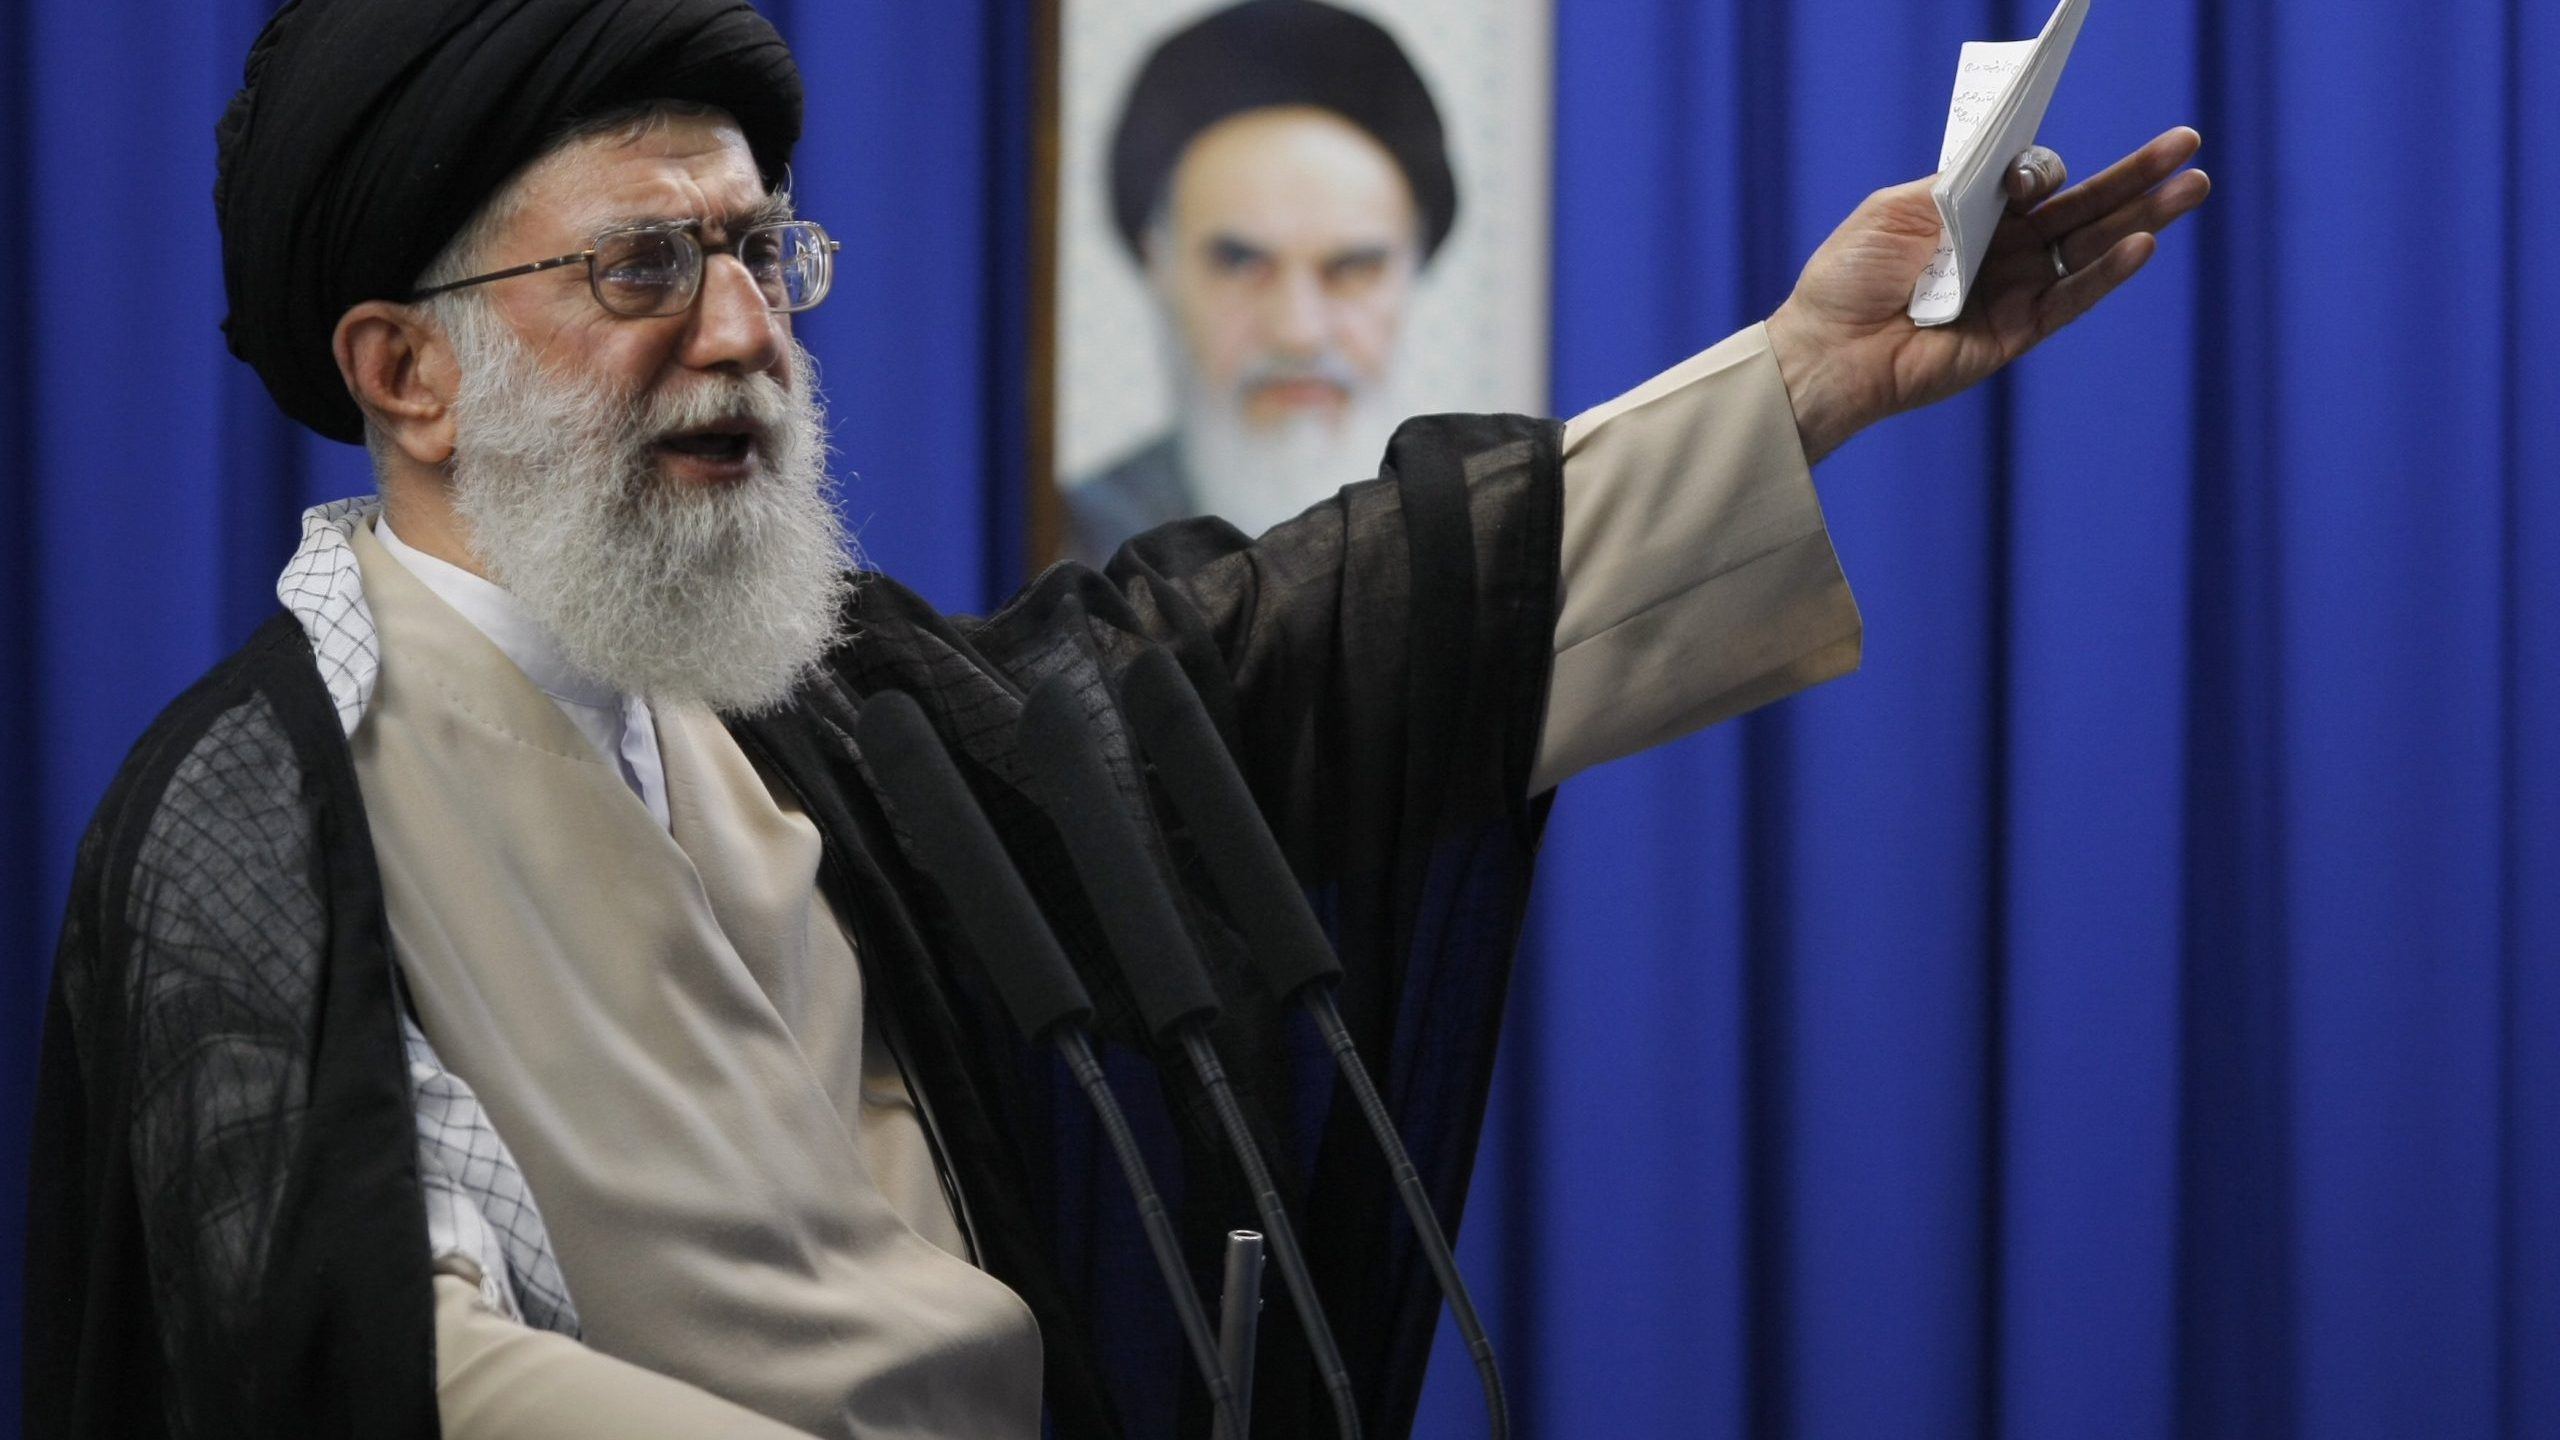 Iran's supreme leader Ayatollah Ali Khamenei delivers the weekly Friday prayer sermonn at Tehran University on June 19, 2009. (Credit: BEHROUZ MEHRI/AFP via Getty Images)